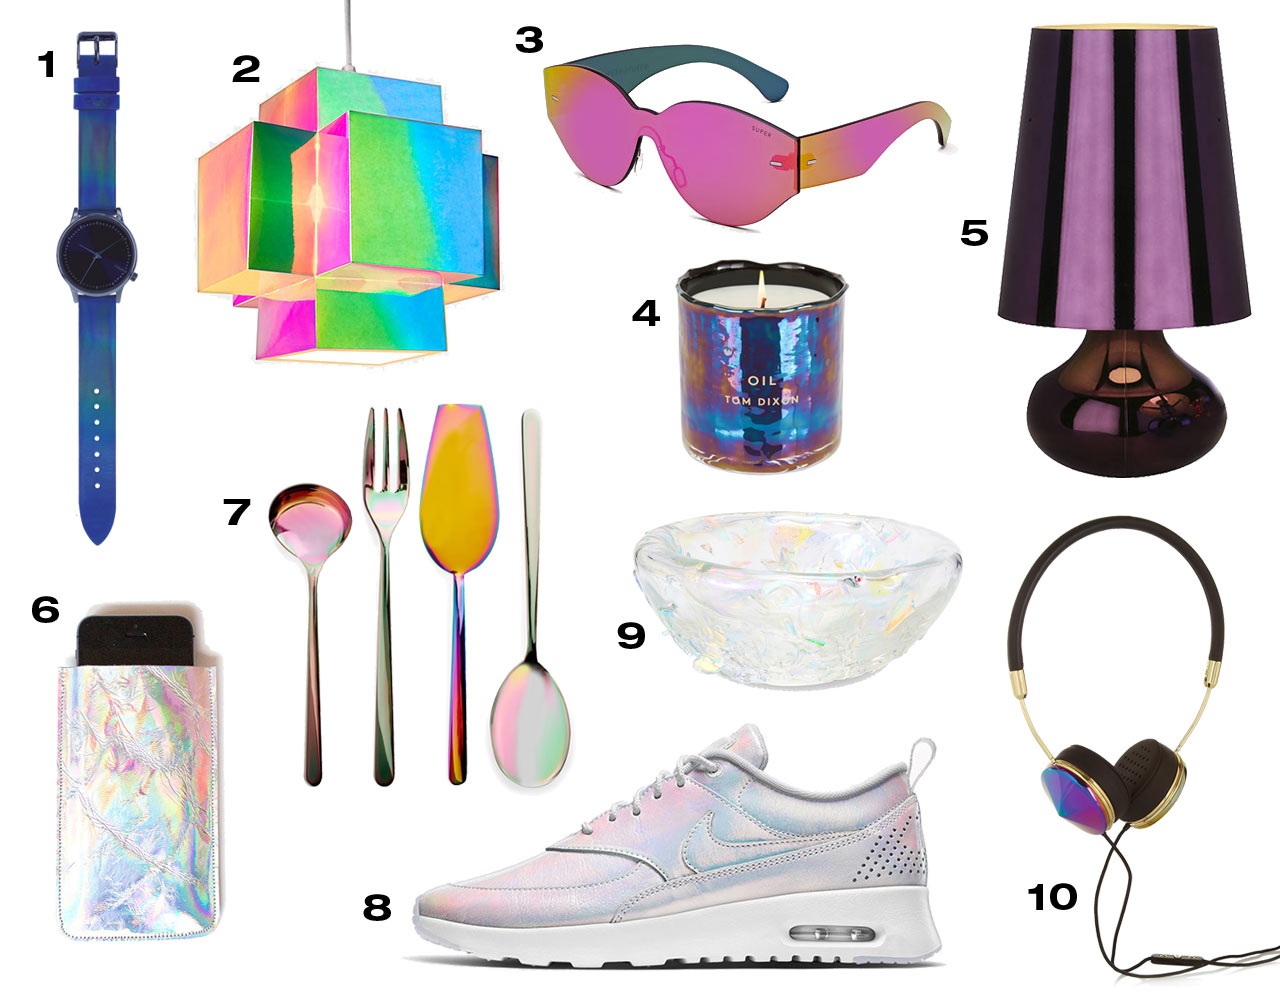 Ooh Shiny: 10 Modern Iridescent Designs